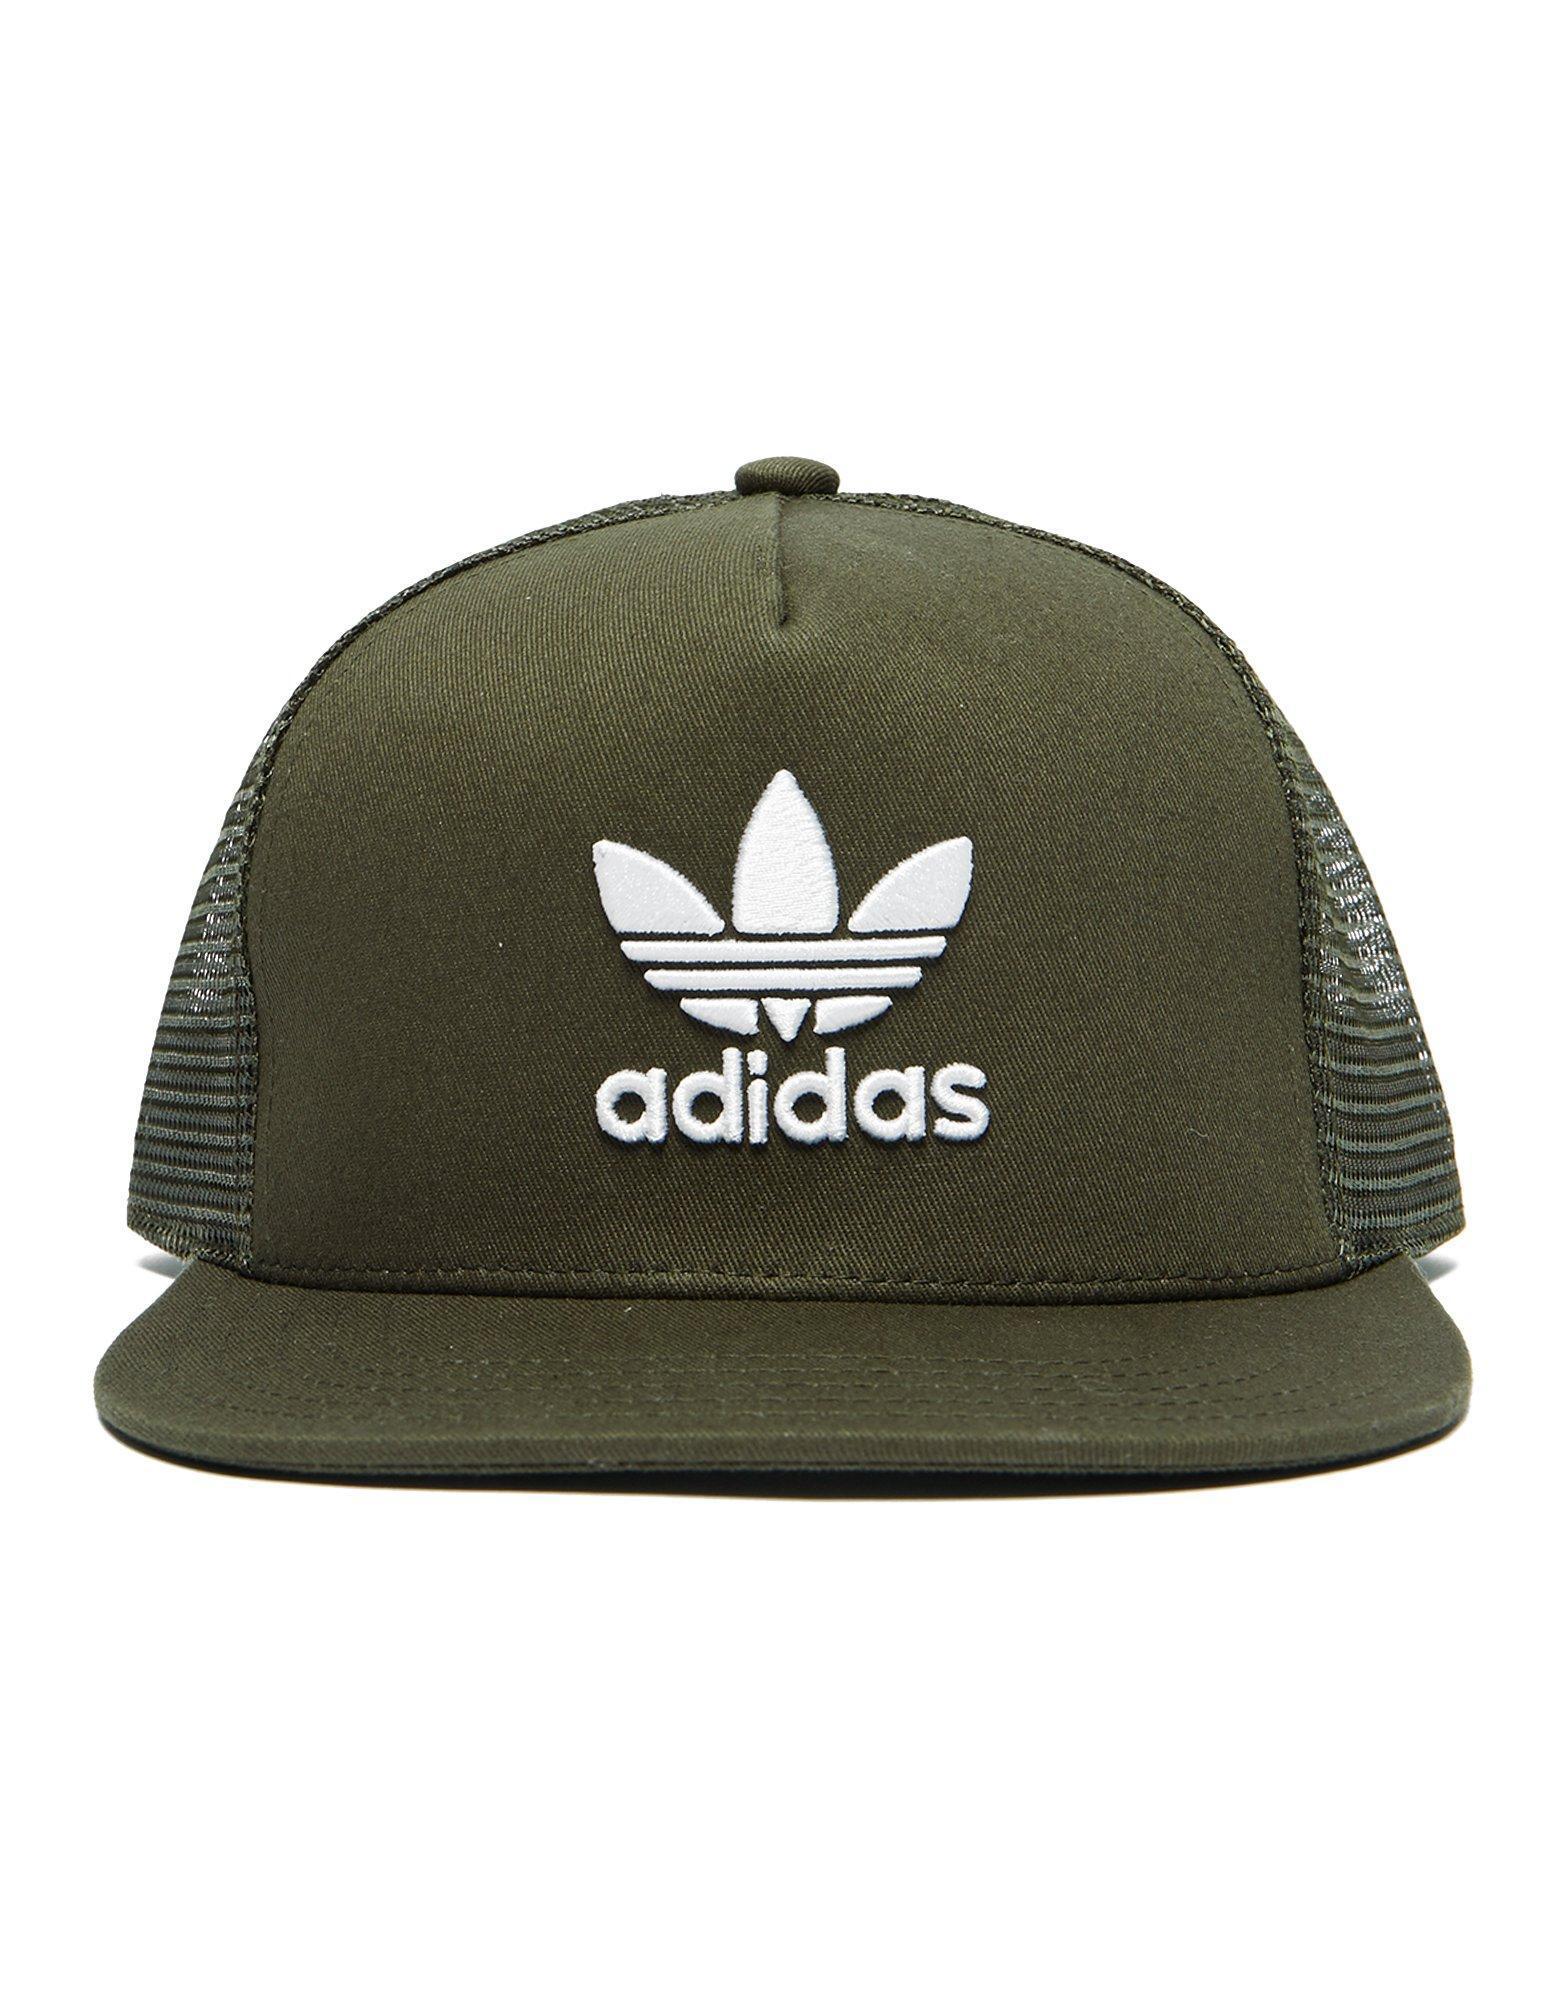 Adidas Originals Trefoil trucker cap - Green adidas A8mQqwkSg